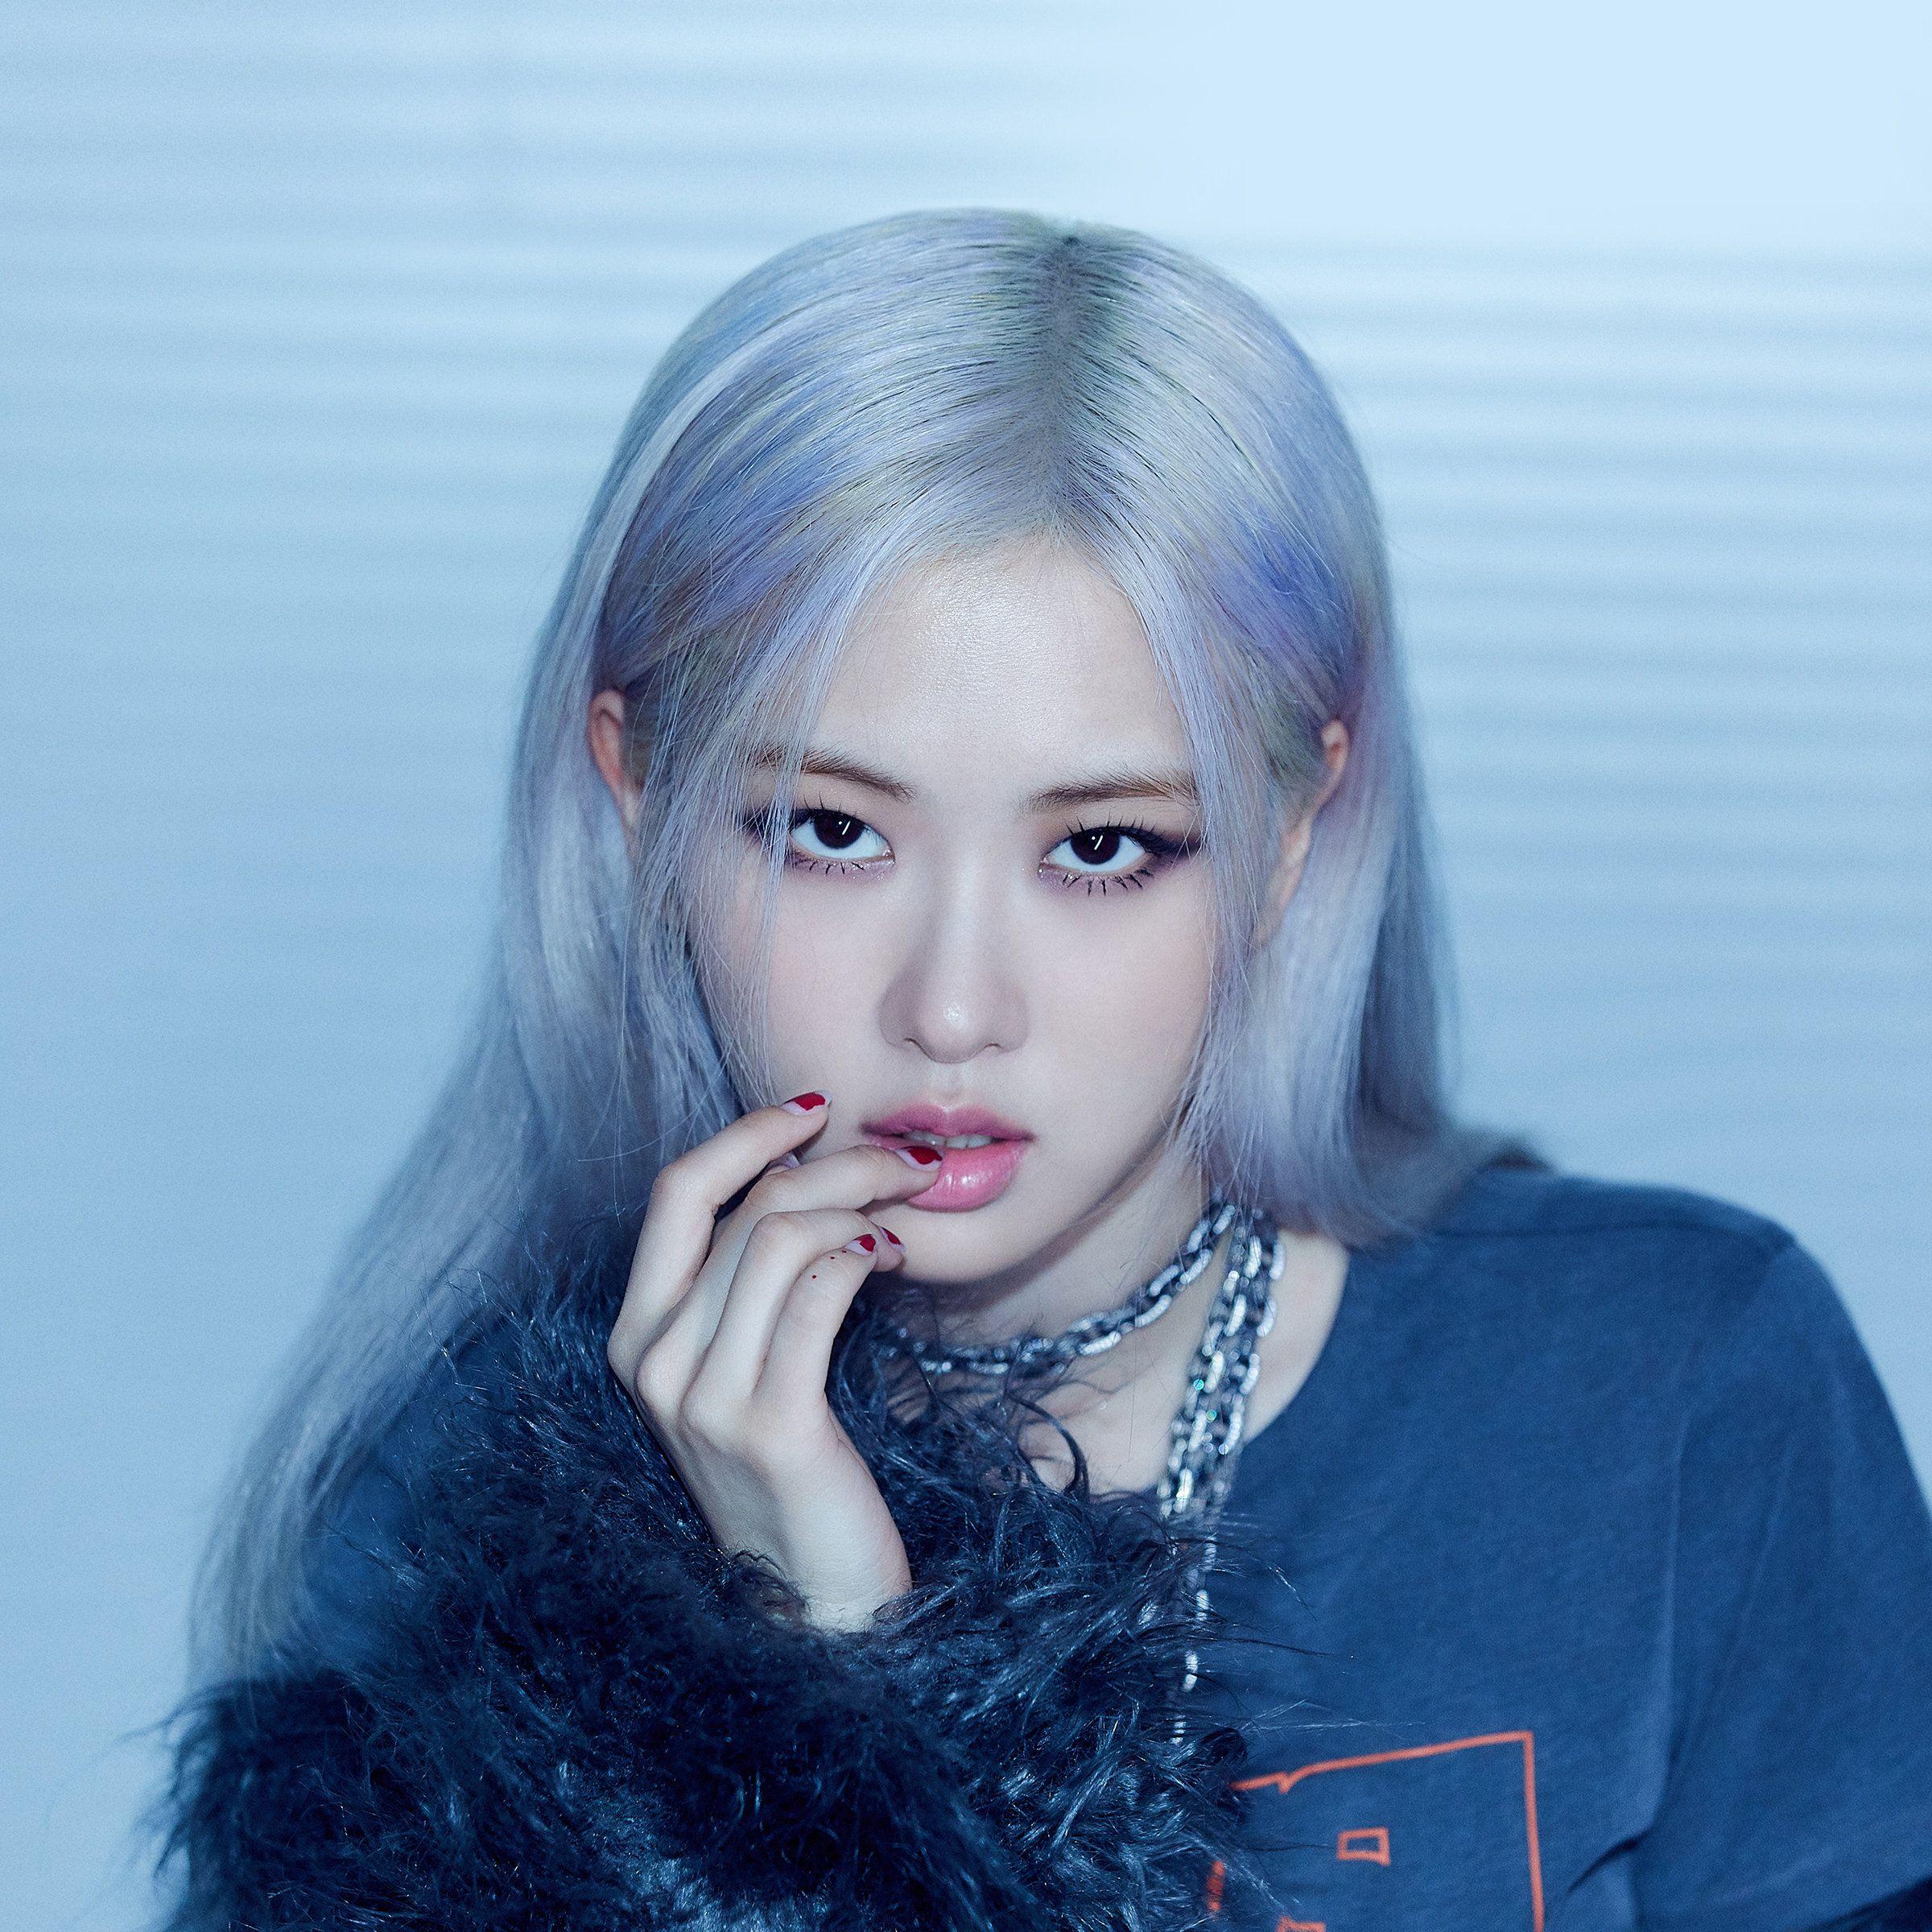 Blackpink The Album Concept Photos Hd Hq Gaya Rambut Selebritas Gadis Korea